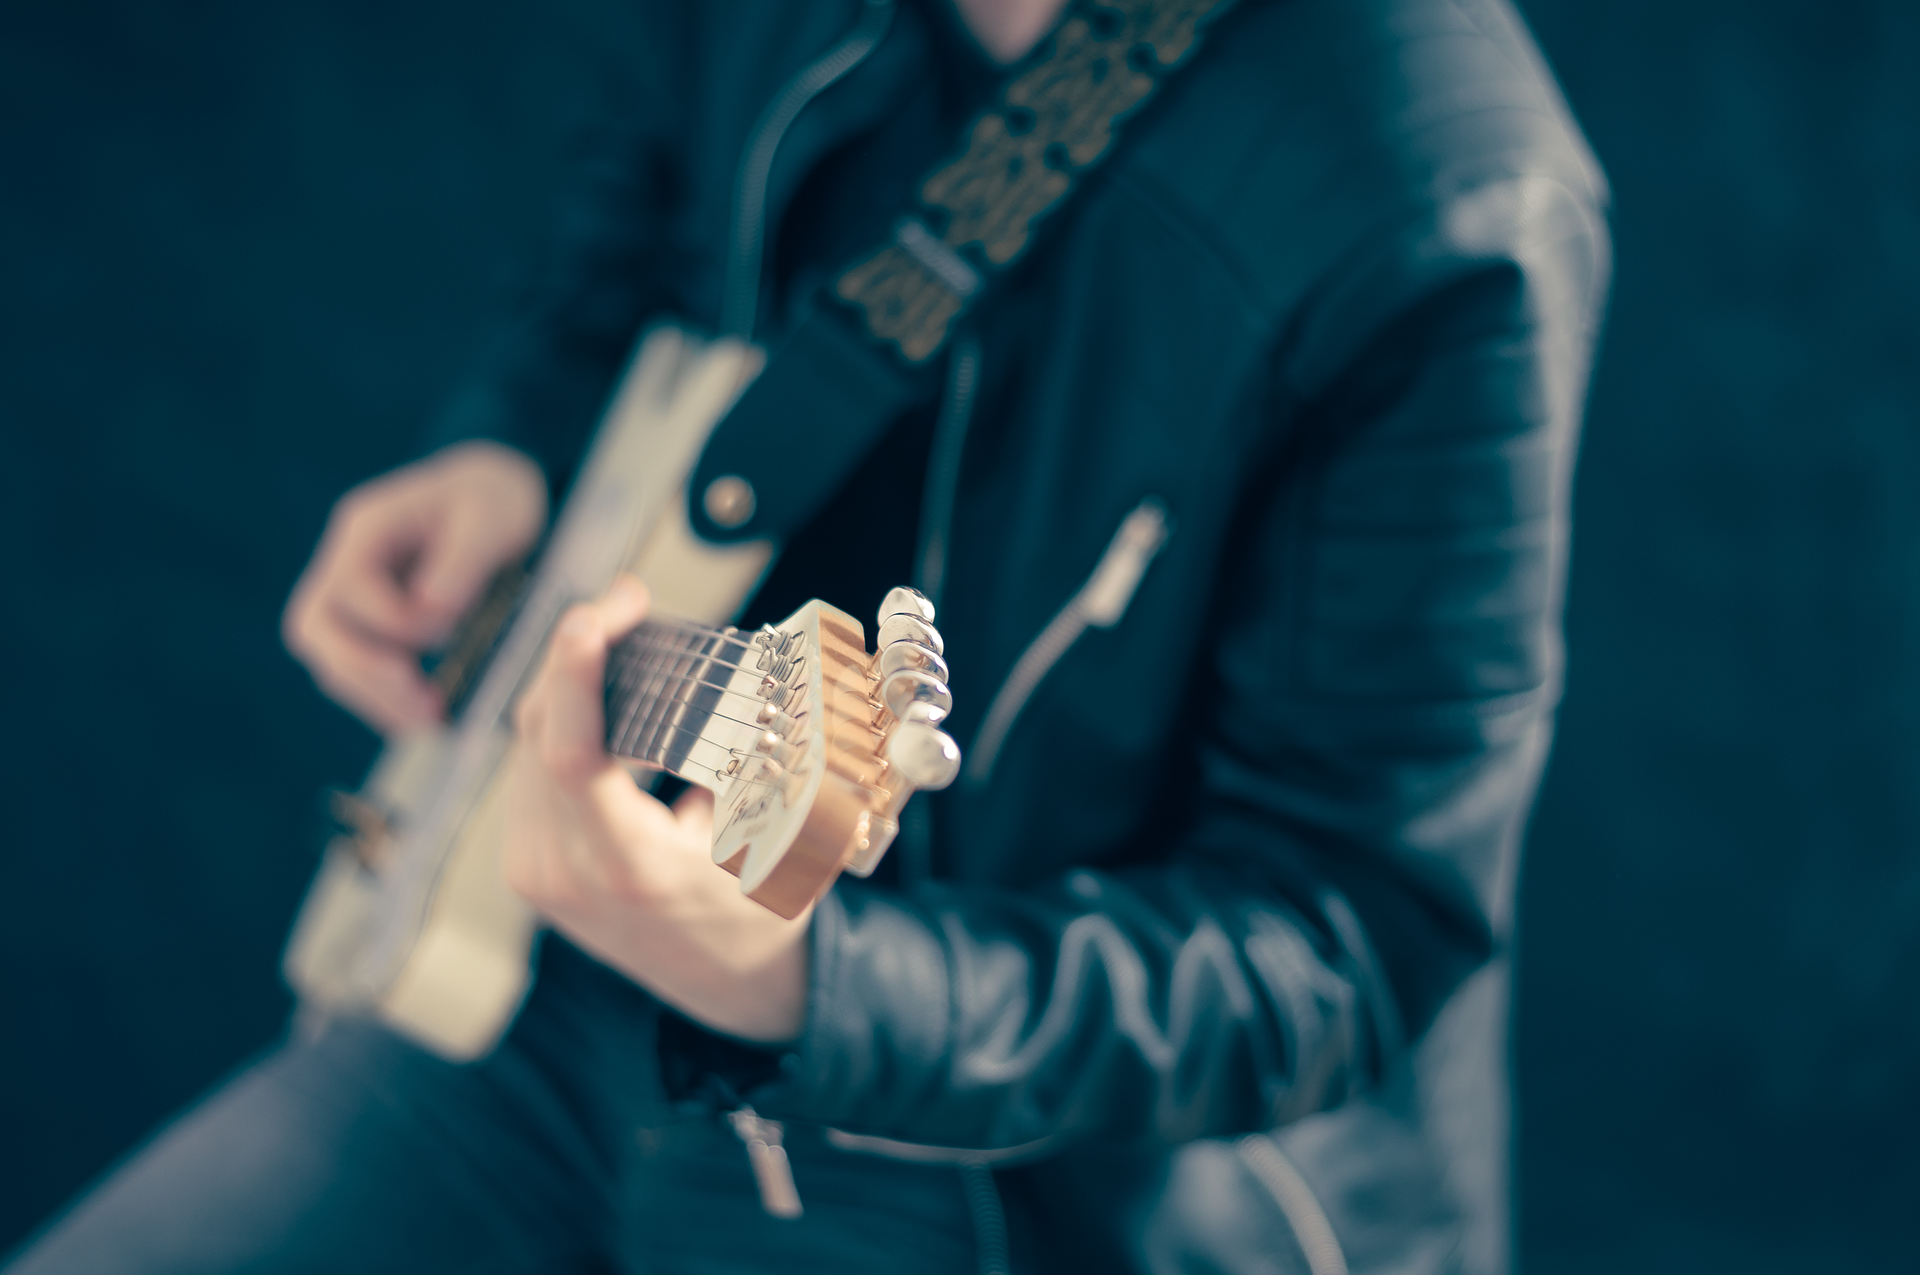 bohemian rhapsody guitarist